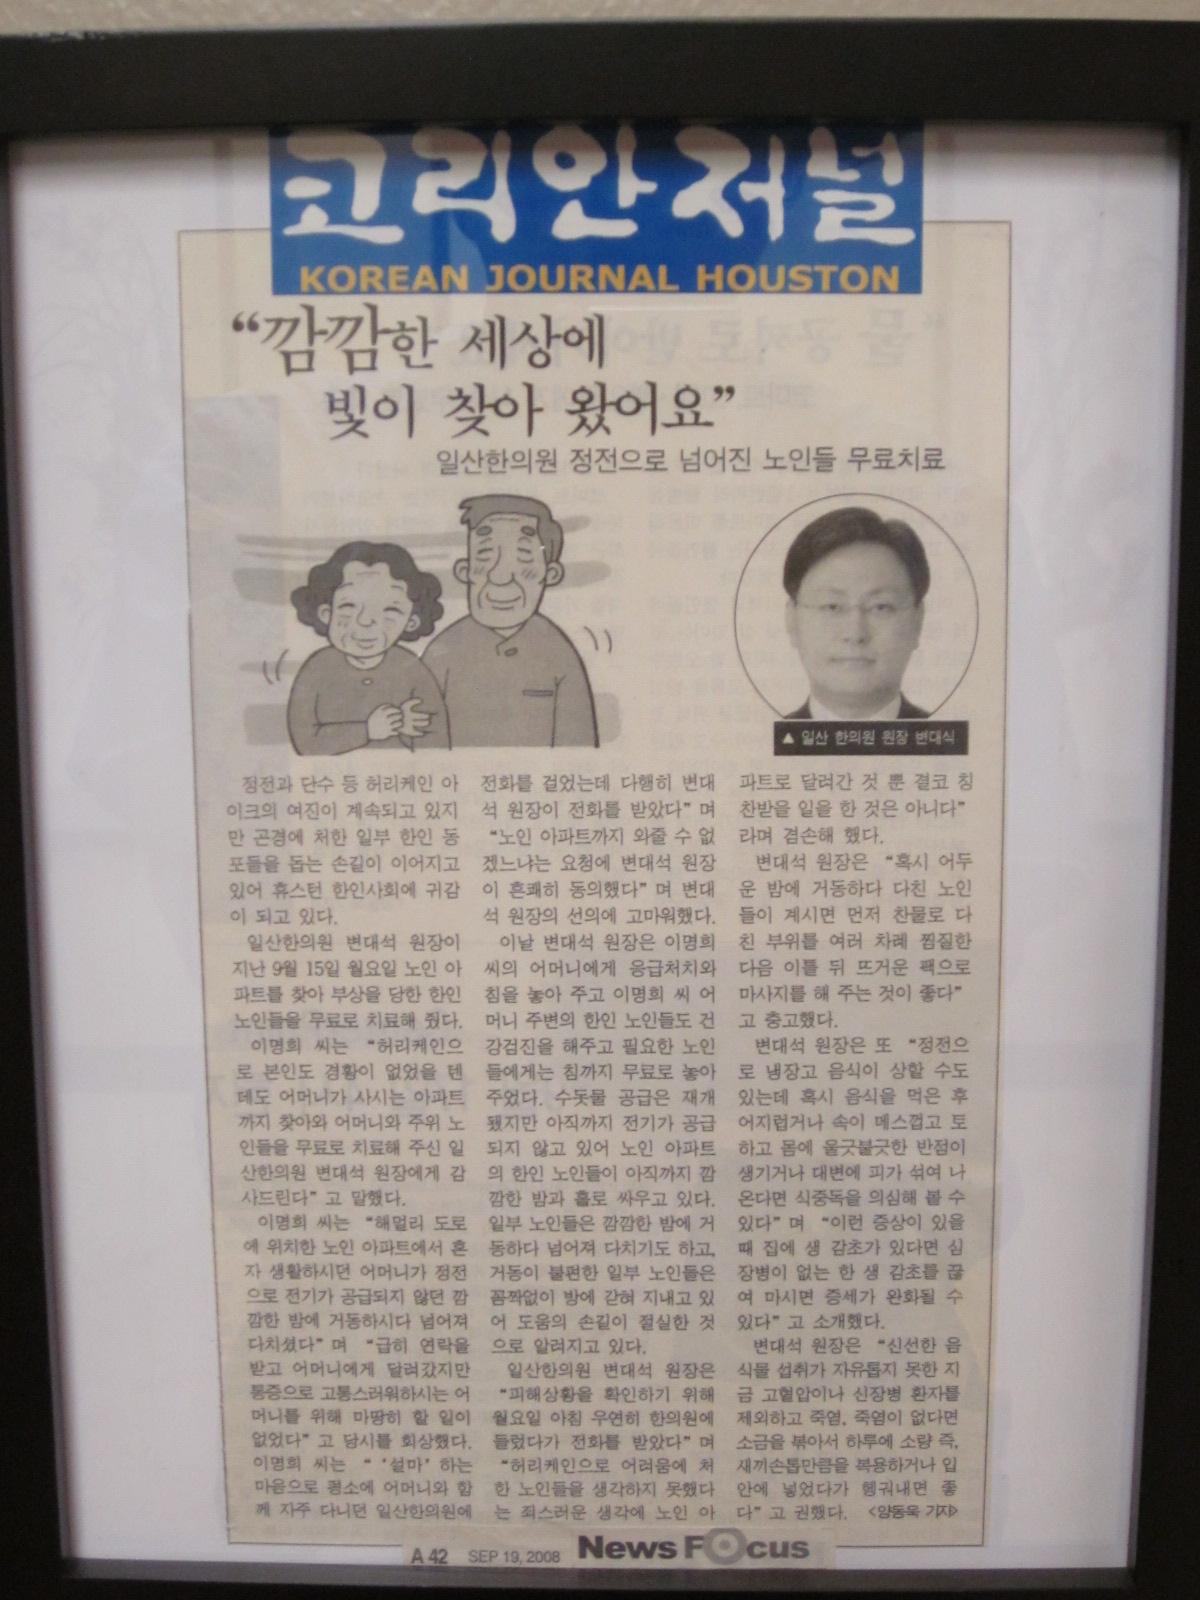 Korea Journal on Sep.19 2008